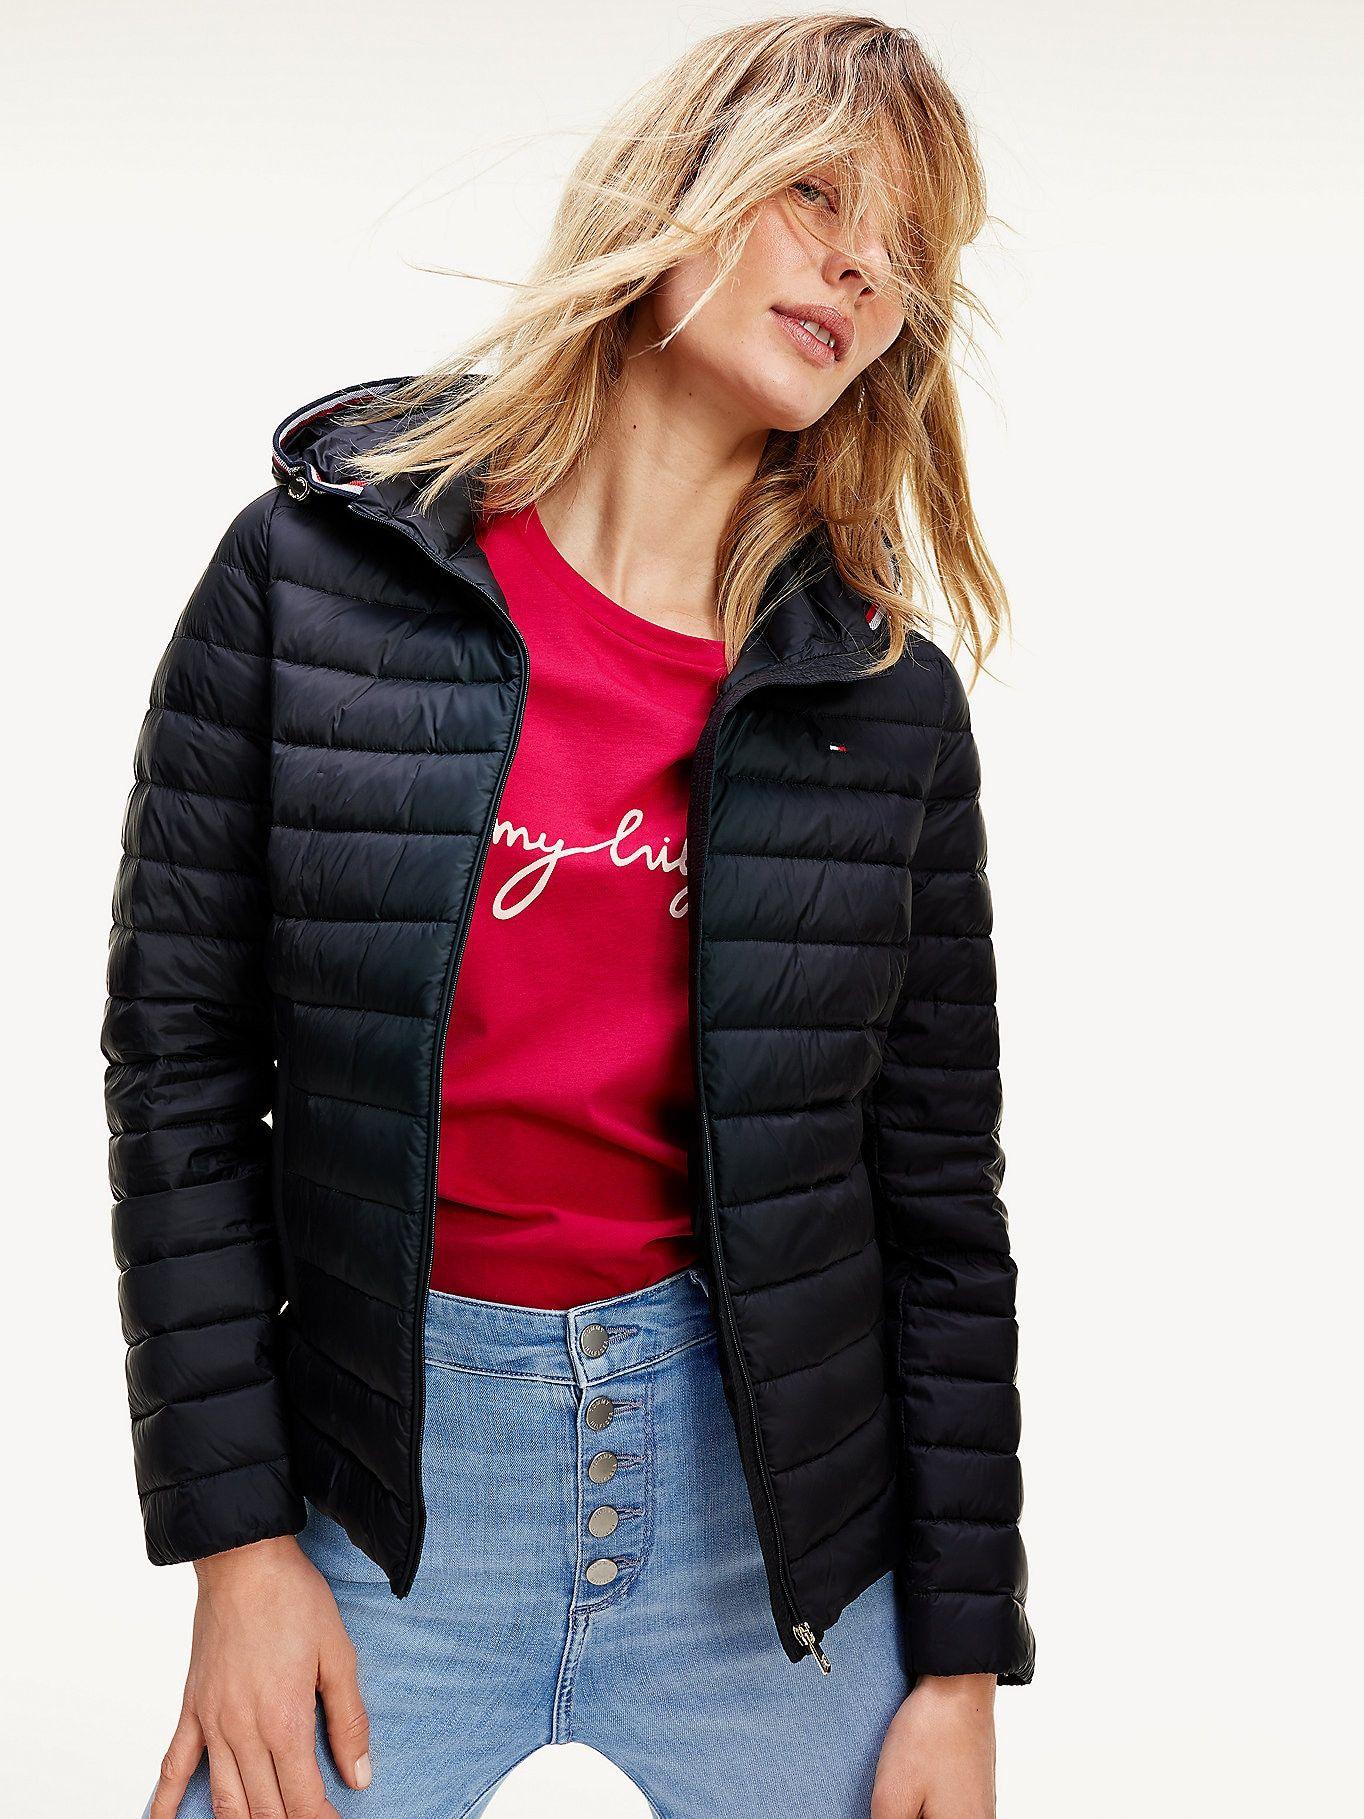 Essential Packable Down Jacket Black Tommy Hilfiger Women S Coats Jackets Outerwear Jackets Tommy Hilfiger [ 1819 x 1364 Pixel ]